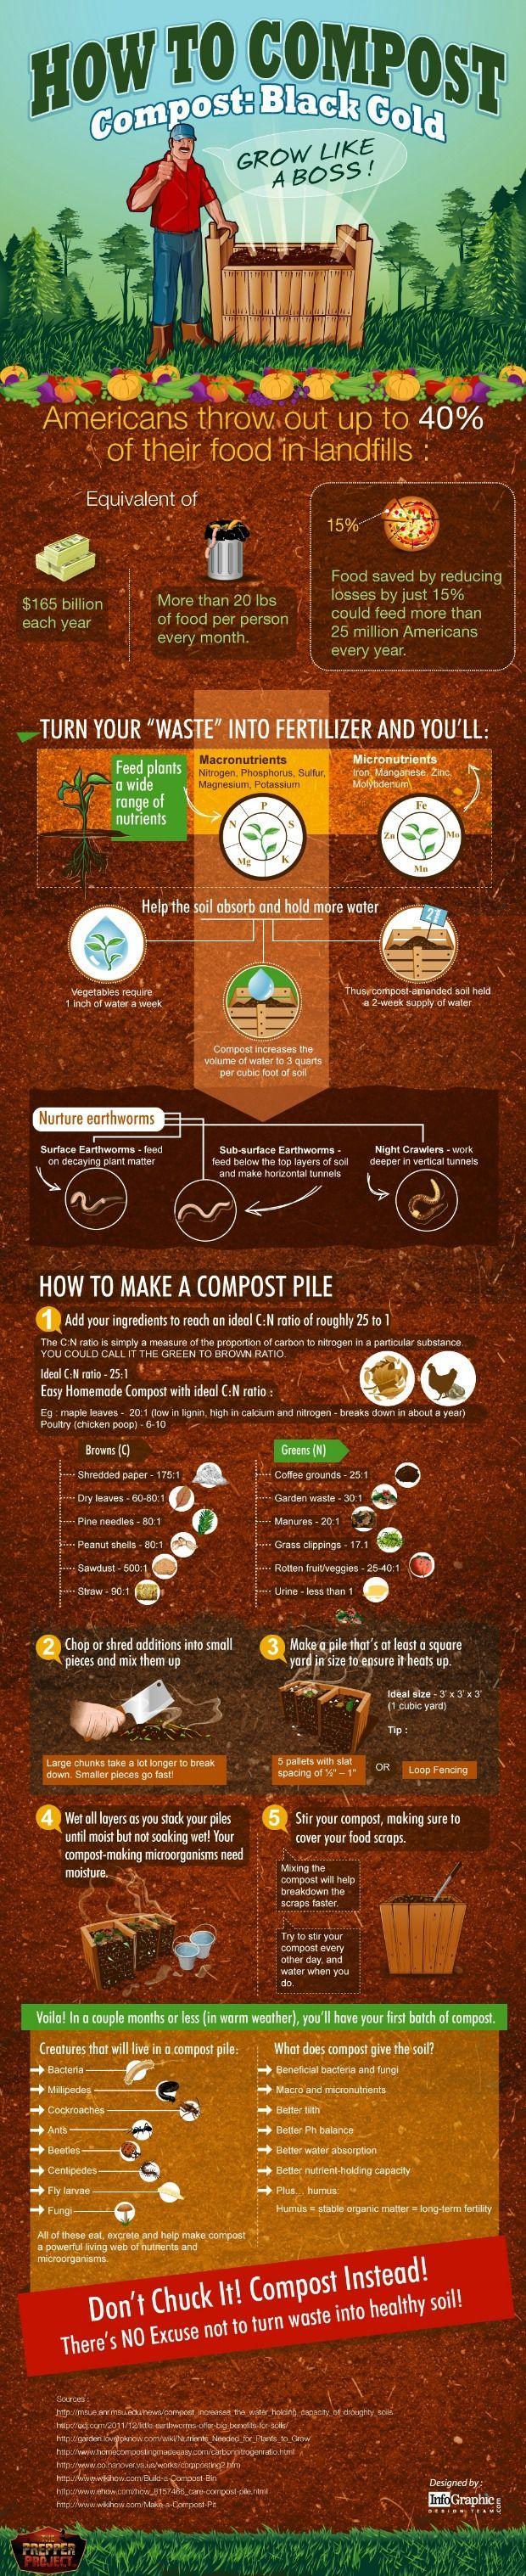 compost like a boss